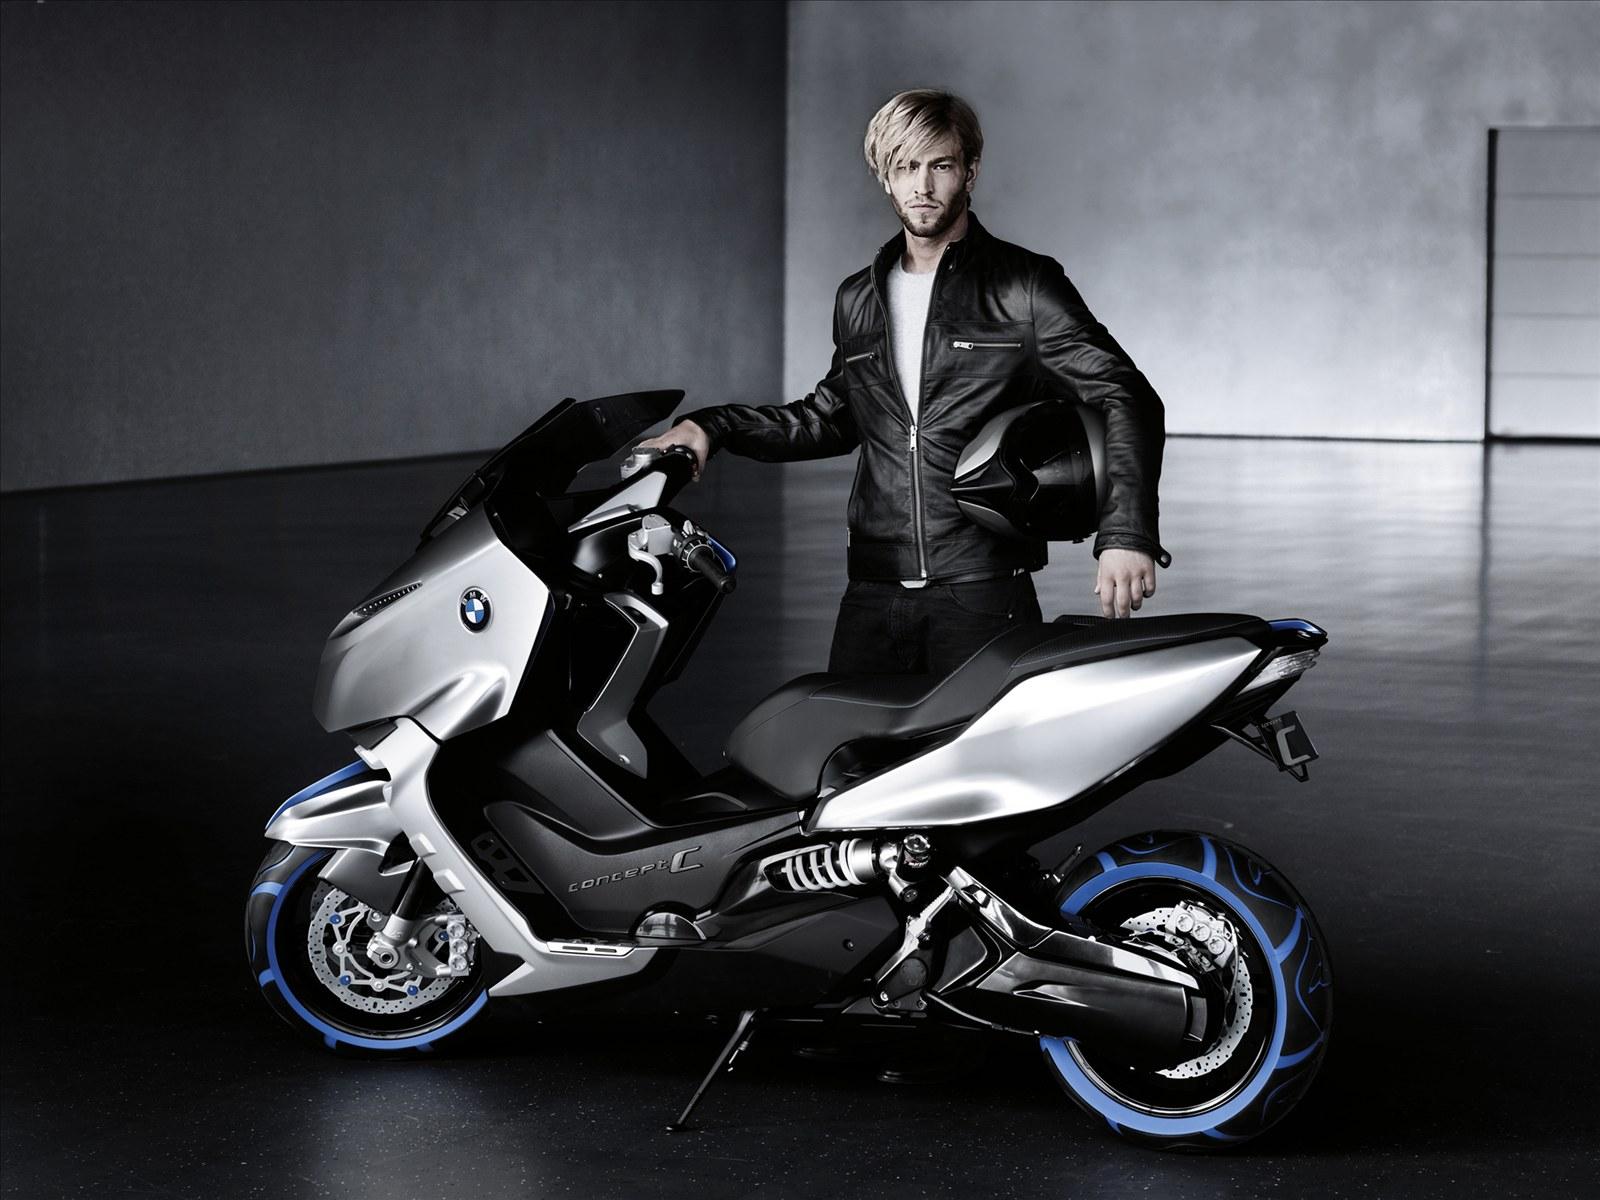 Обои для рабочего стола Мотороллер BMW Scooter C Concept Мотоциклы Скутер мотоцикл